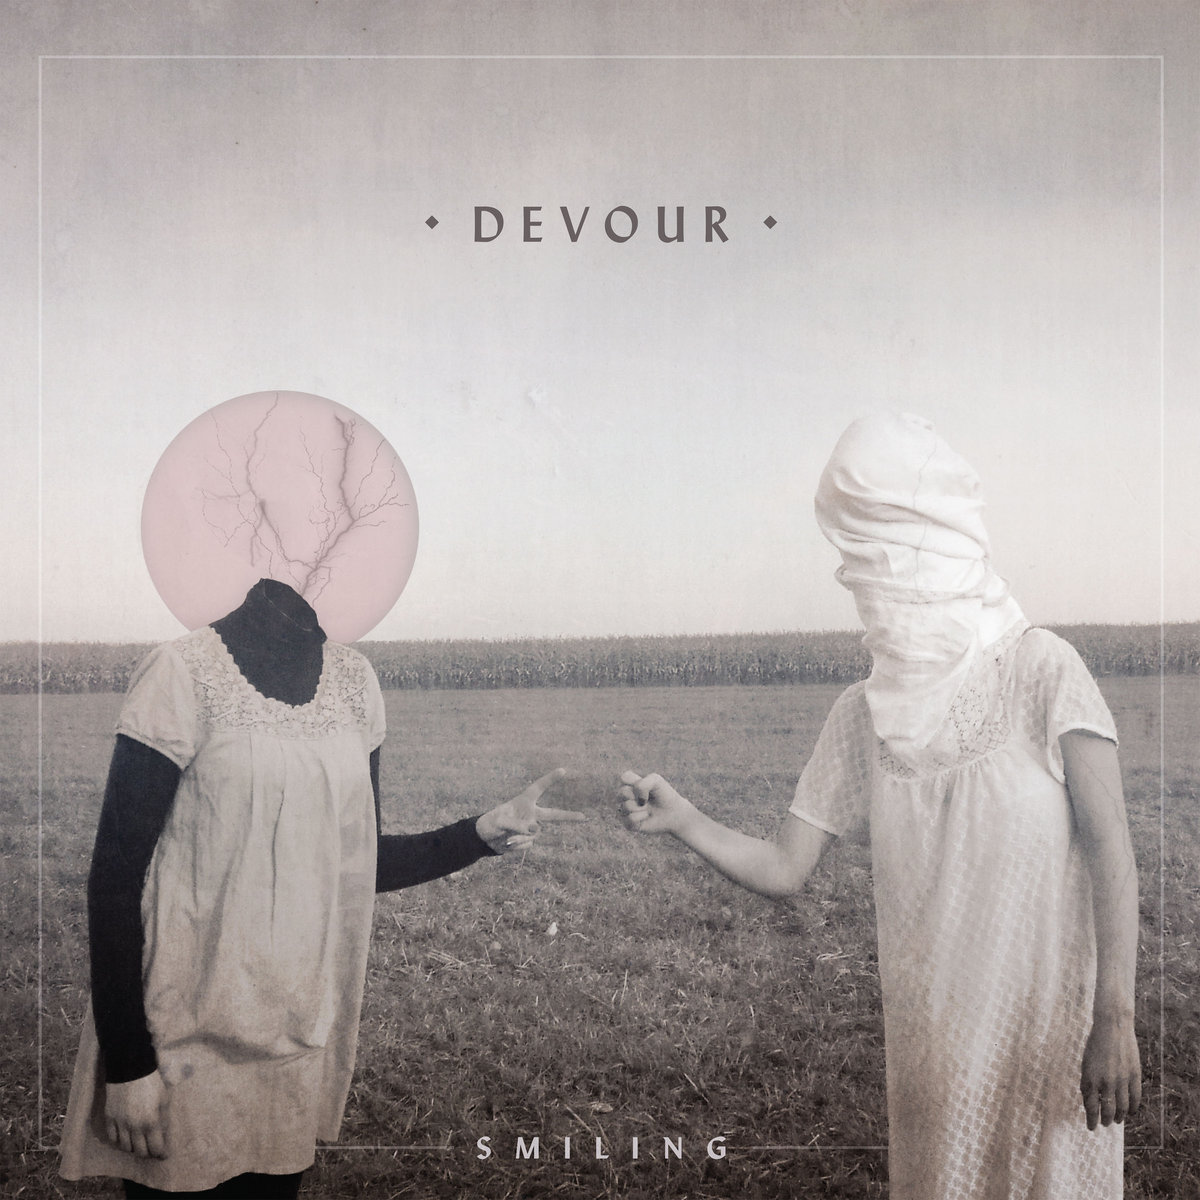 Devour-Smiling album cover